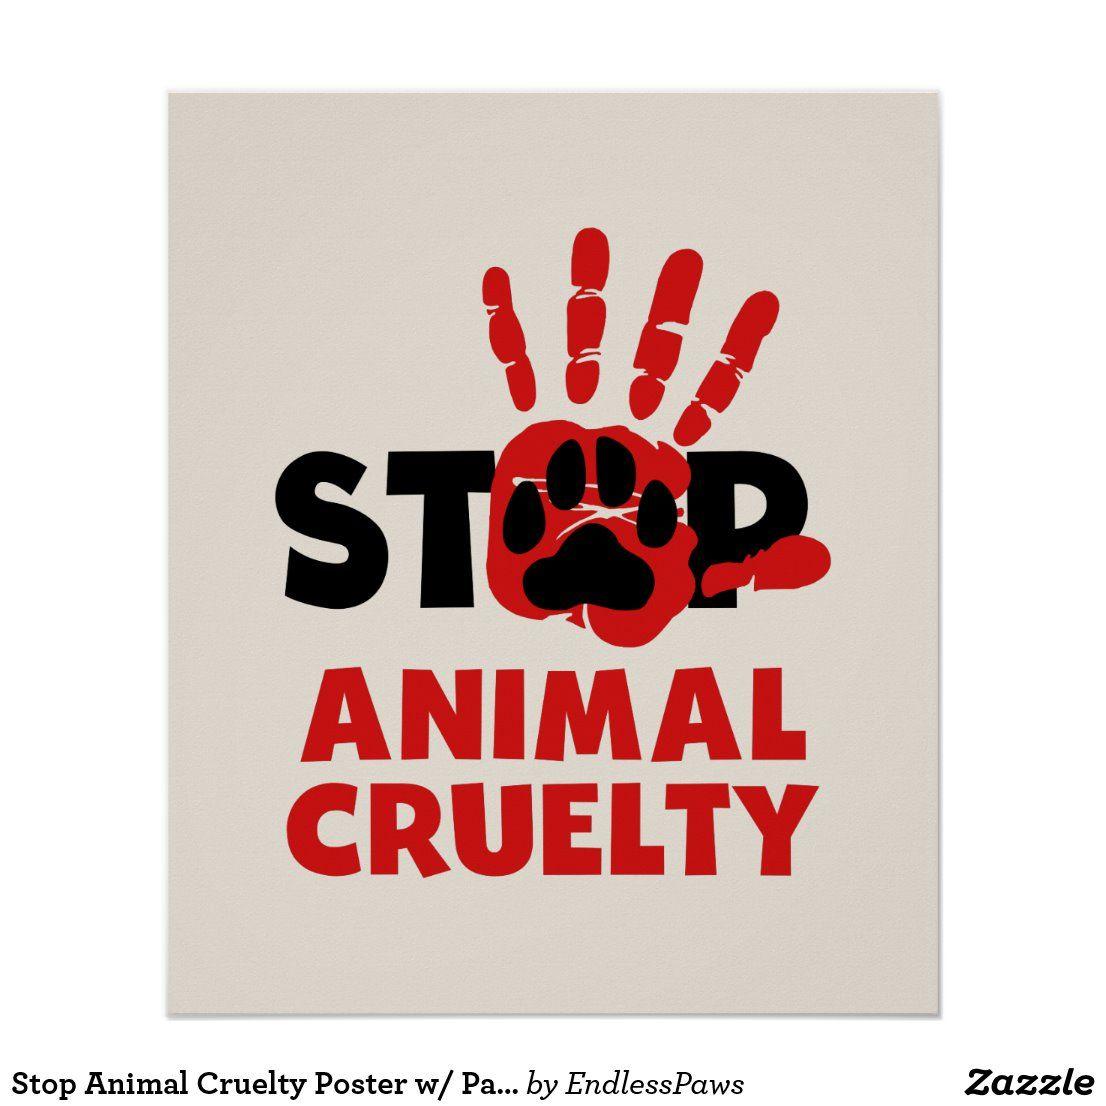 Stop Animal Cruelty Poster W Paw Print Human Hand Zazzle Com In 2020 Stop Animal Cruelty Paw Print Animal Cruelty